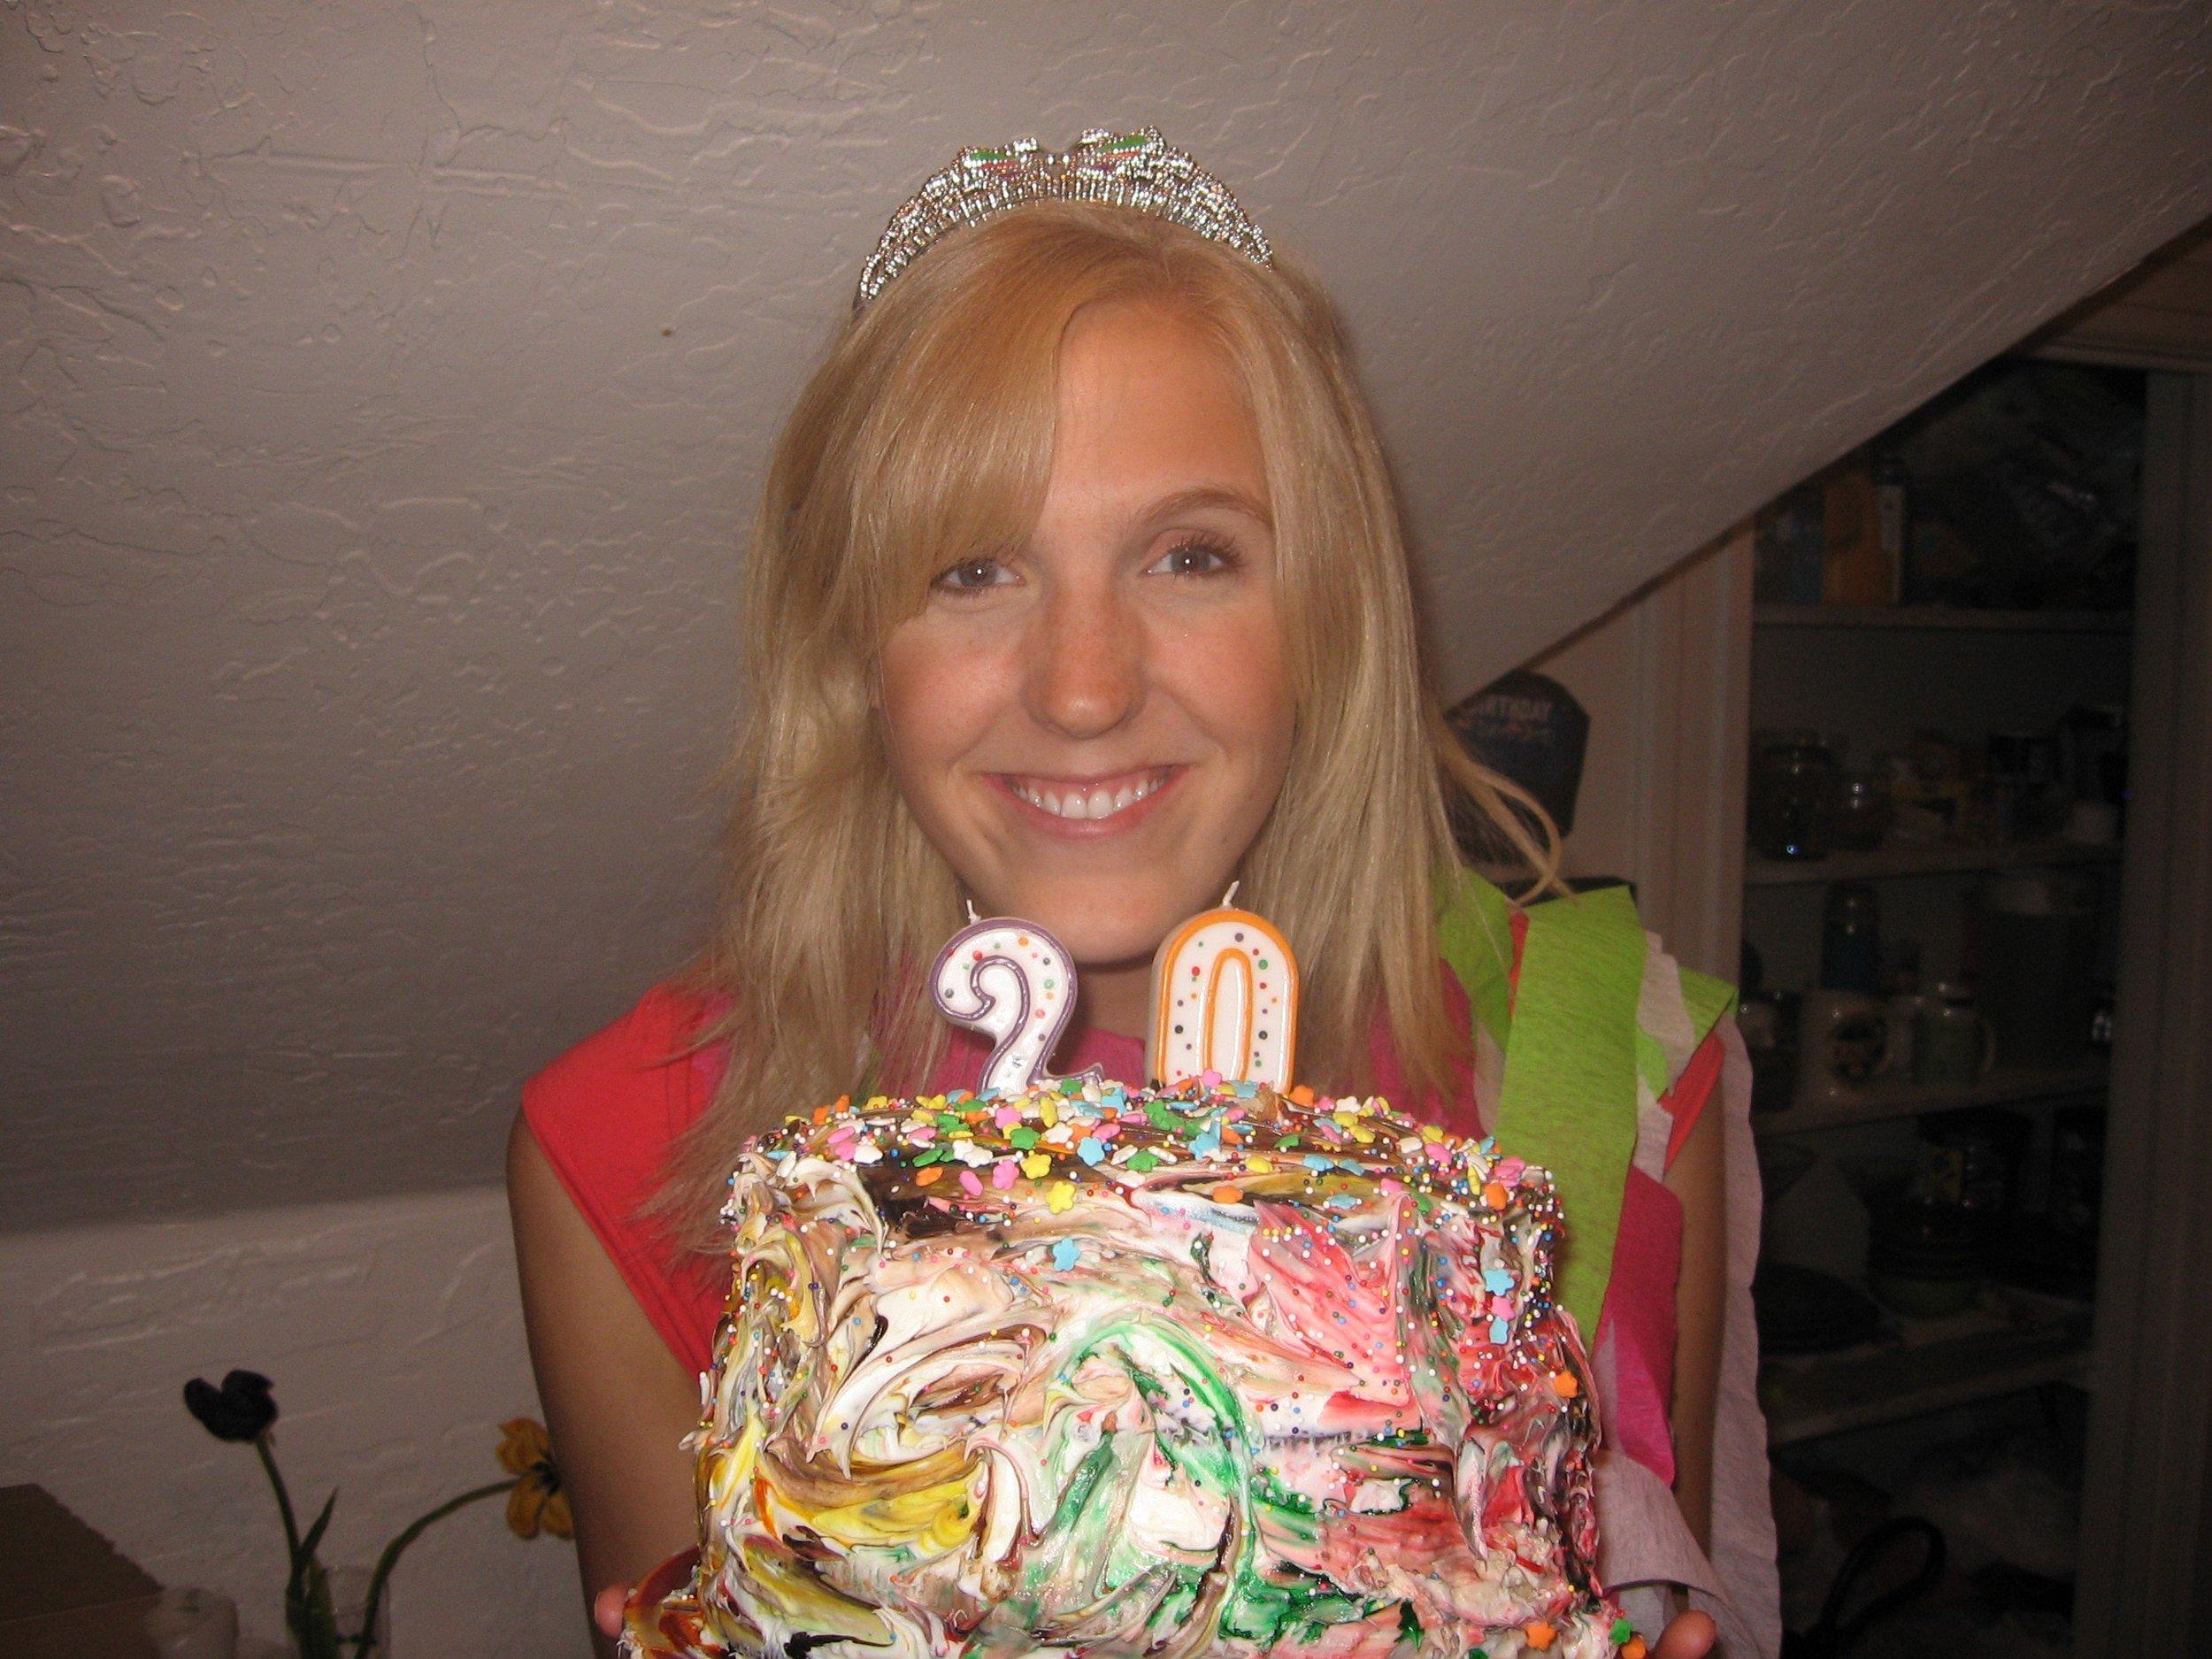 20th birthday cake.